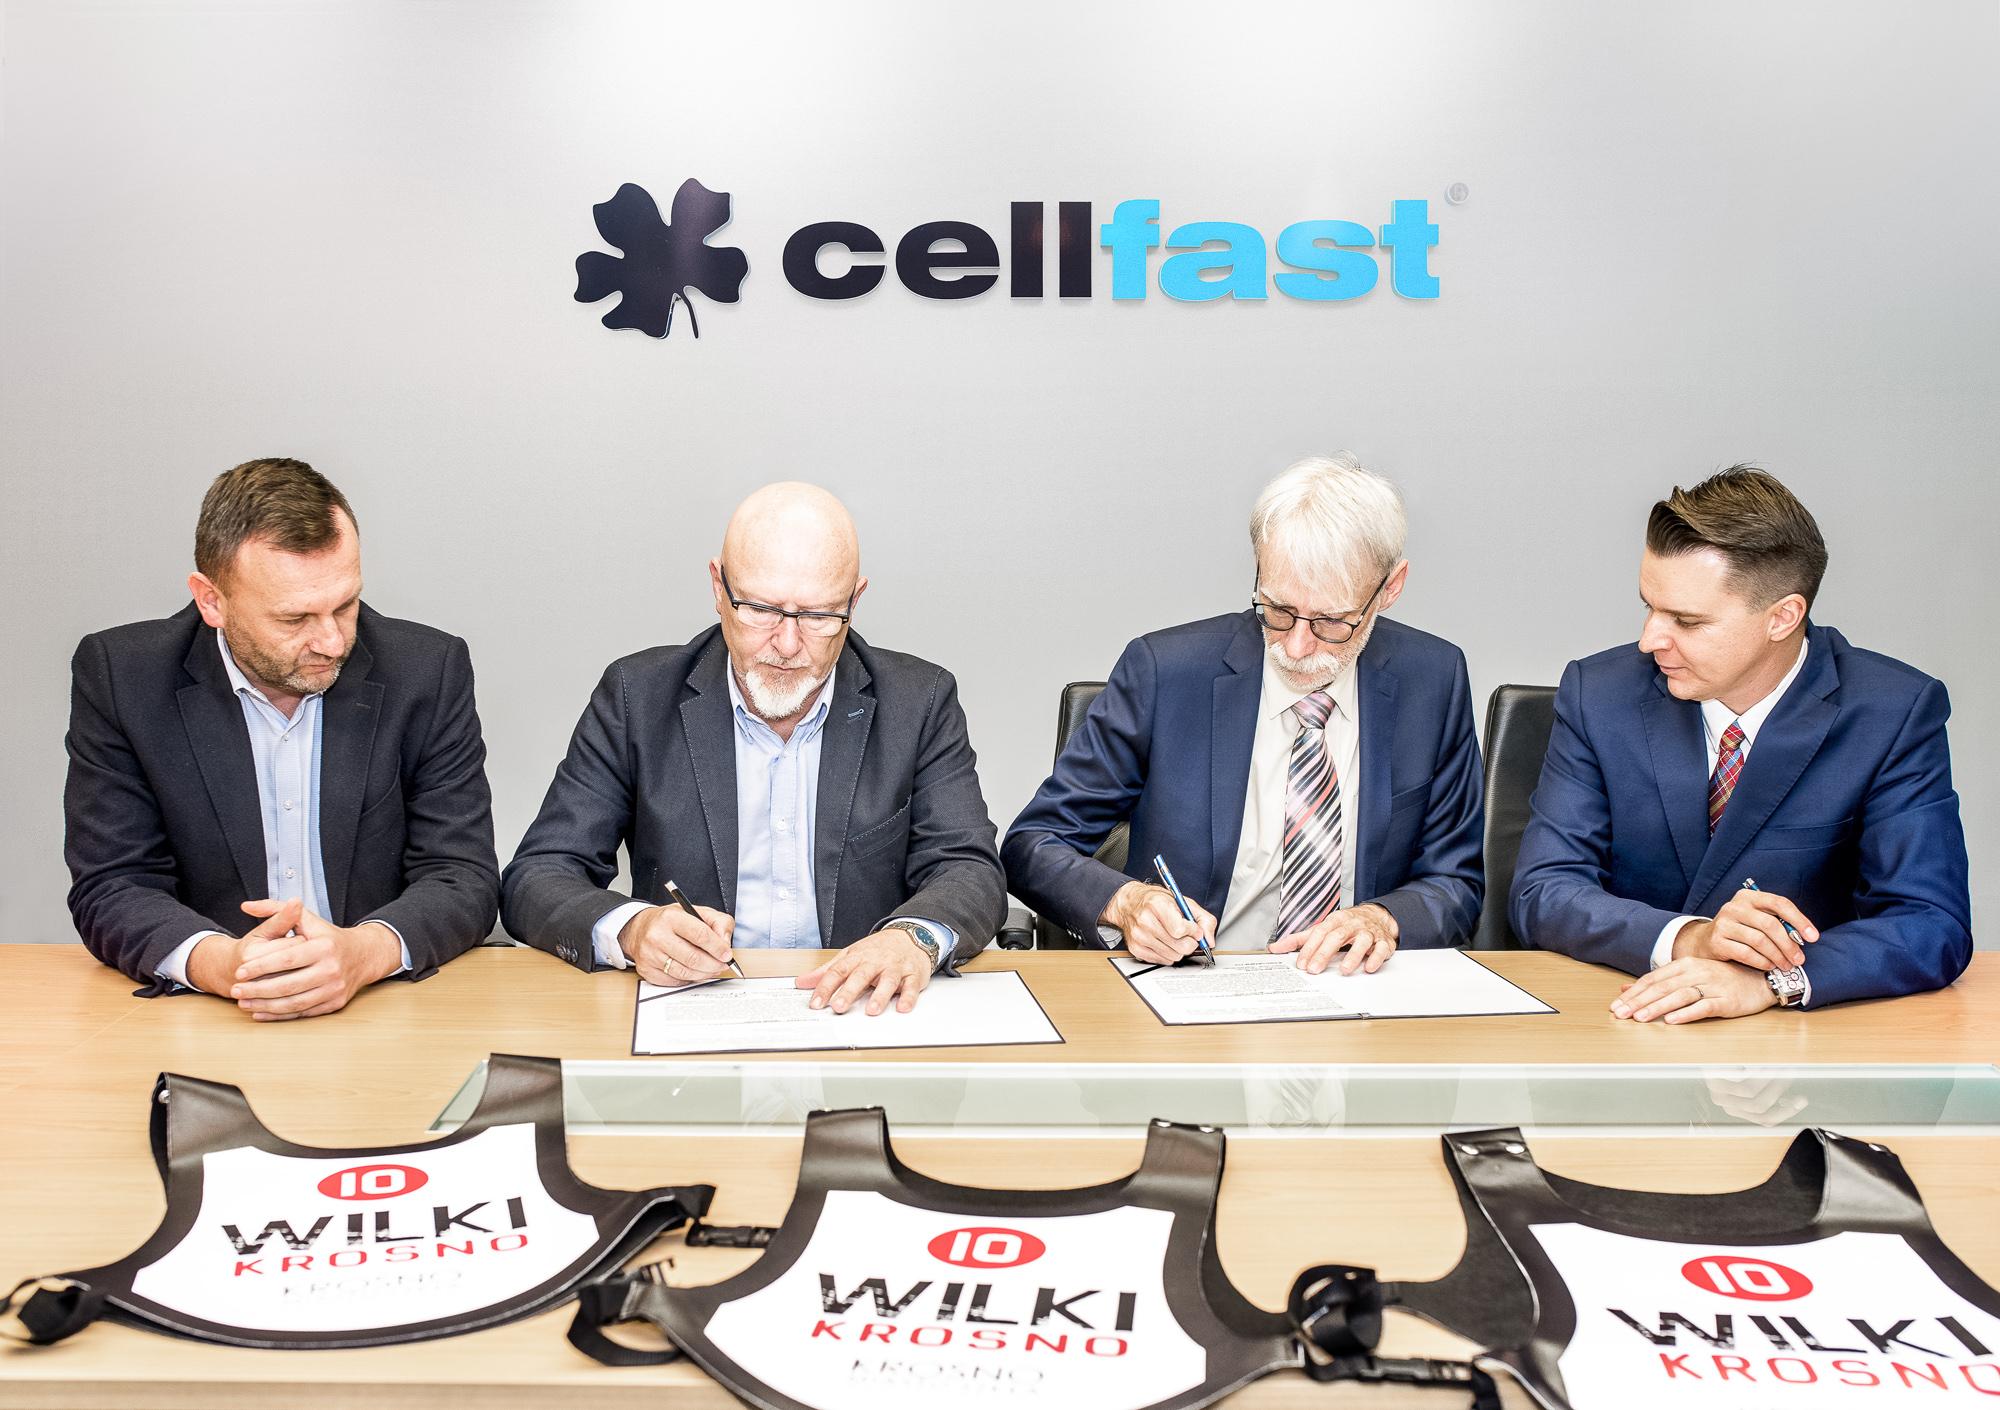 Cellfast Wilki1